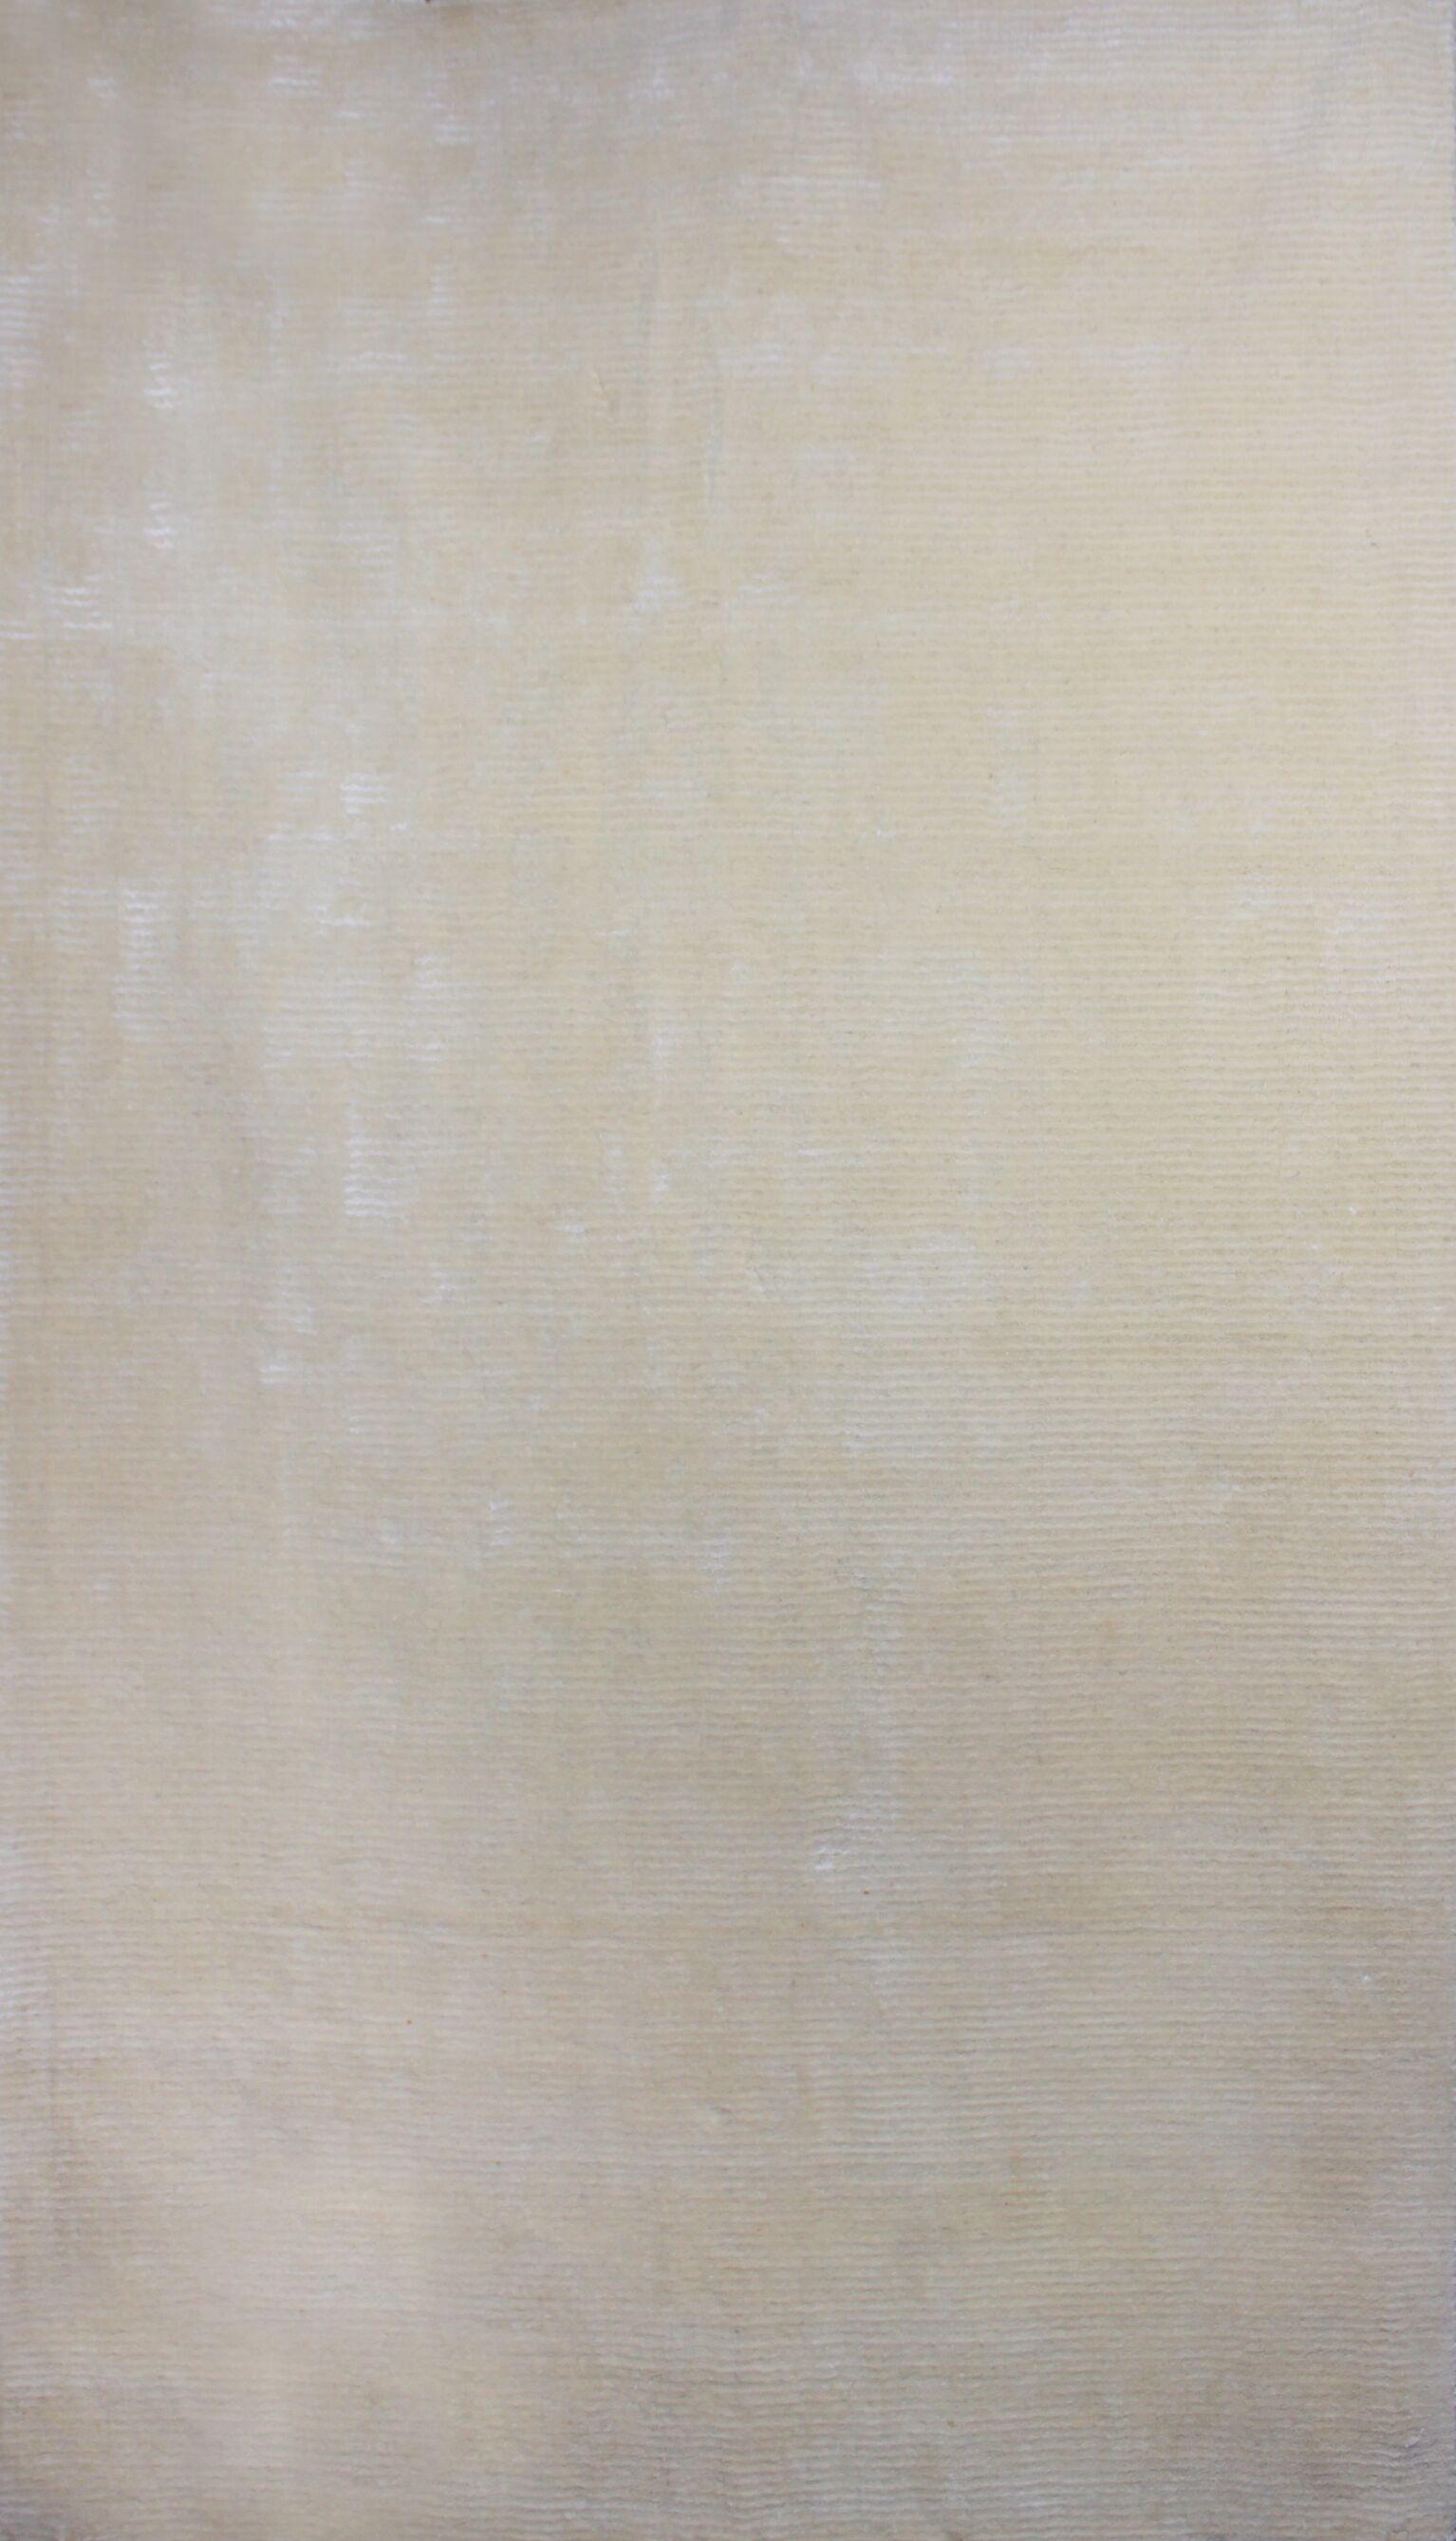 Brigg Hand-Tufted Ivory Area Rug Rug Size: 9' x 13'